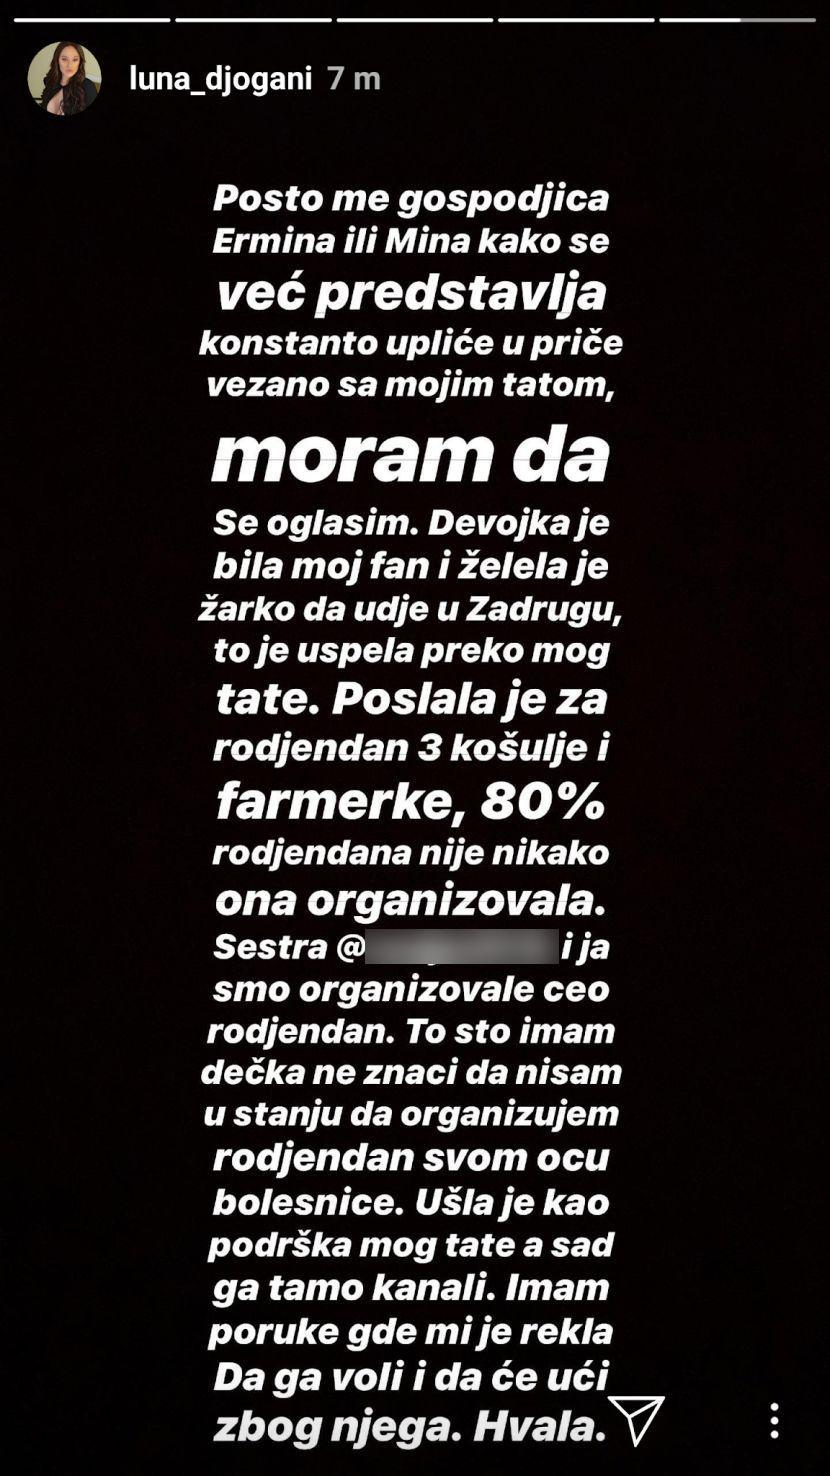 Luna Đogani, Gagi, Ermina